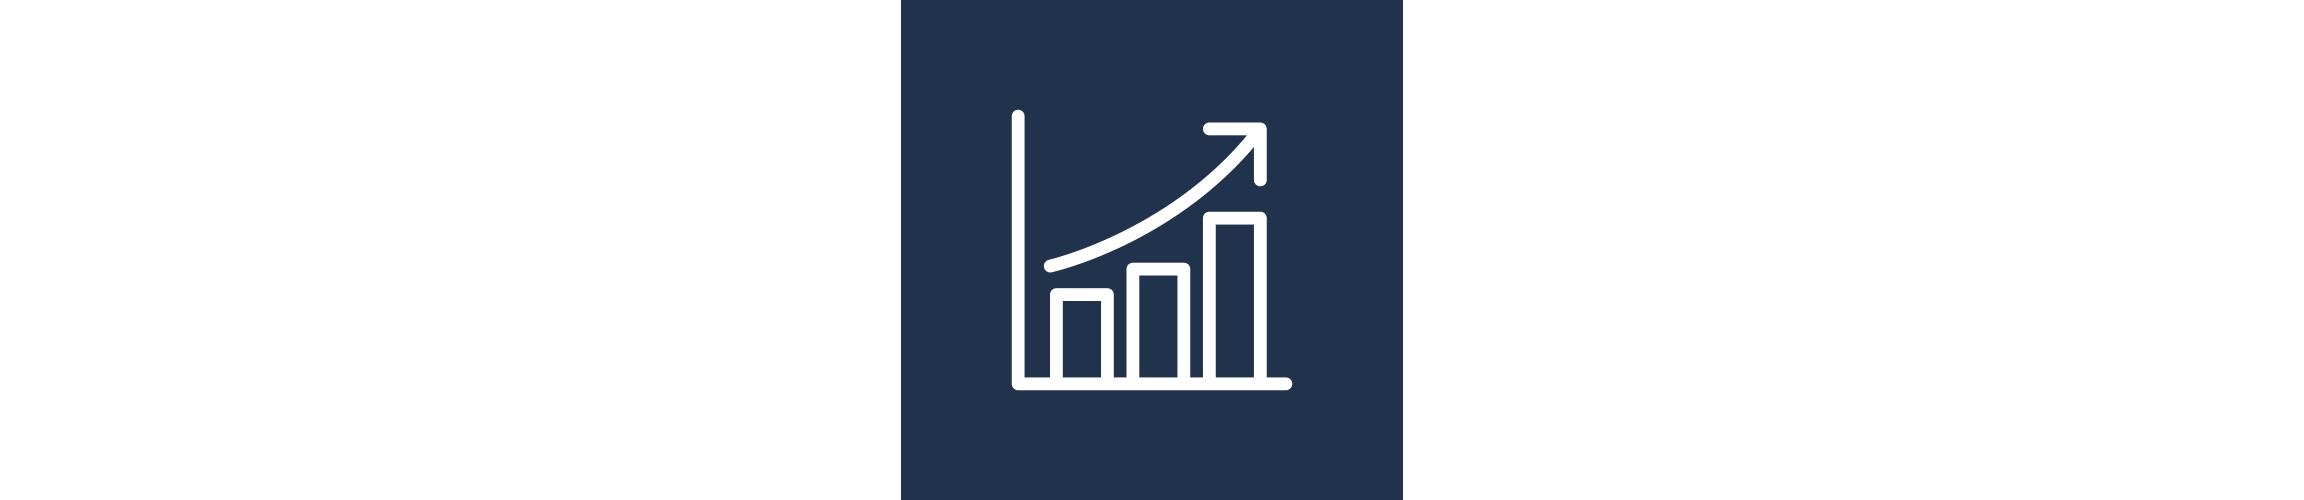 pre-col-graph-increase.png